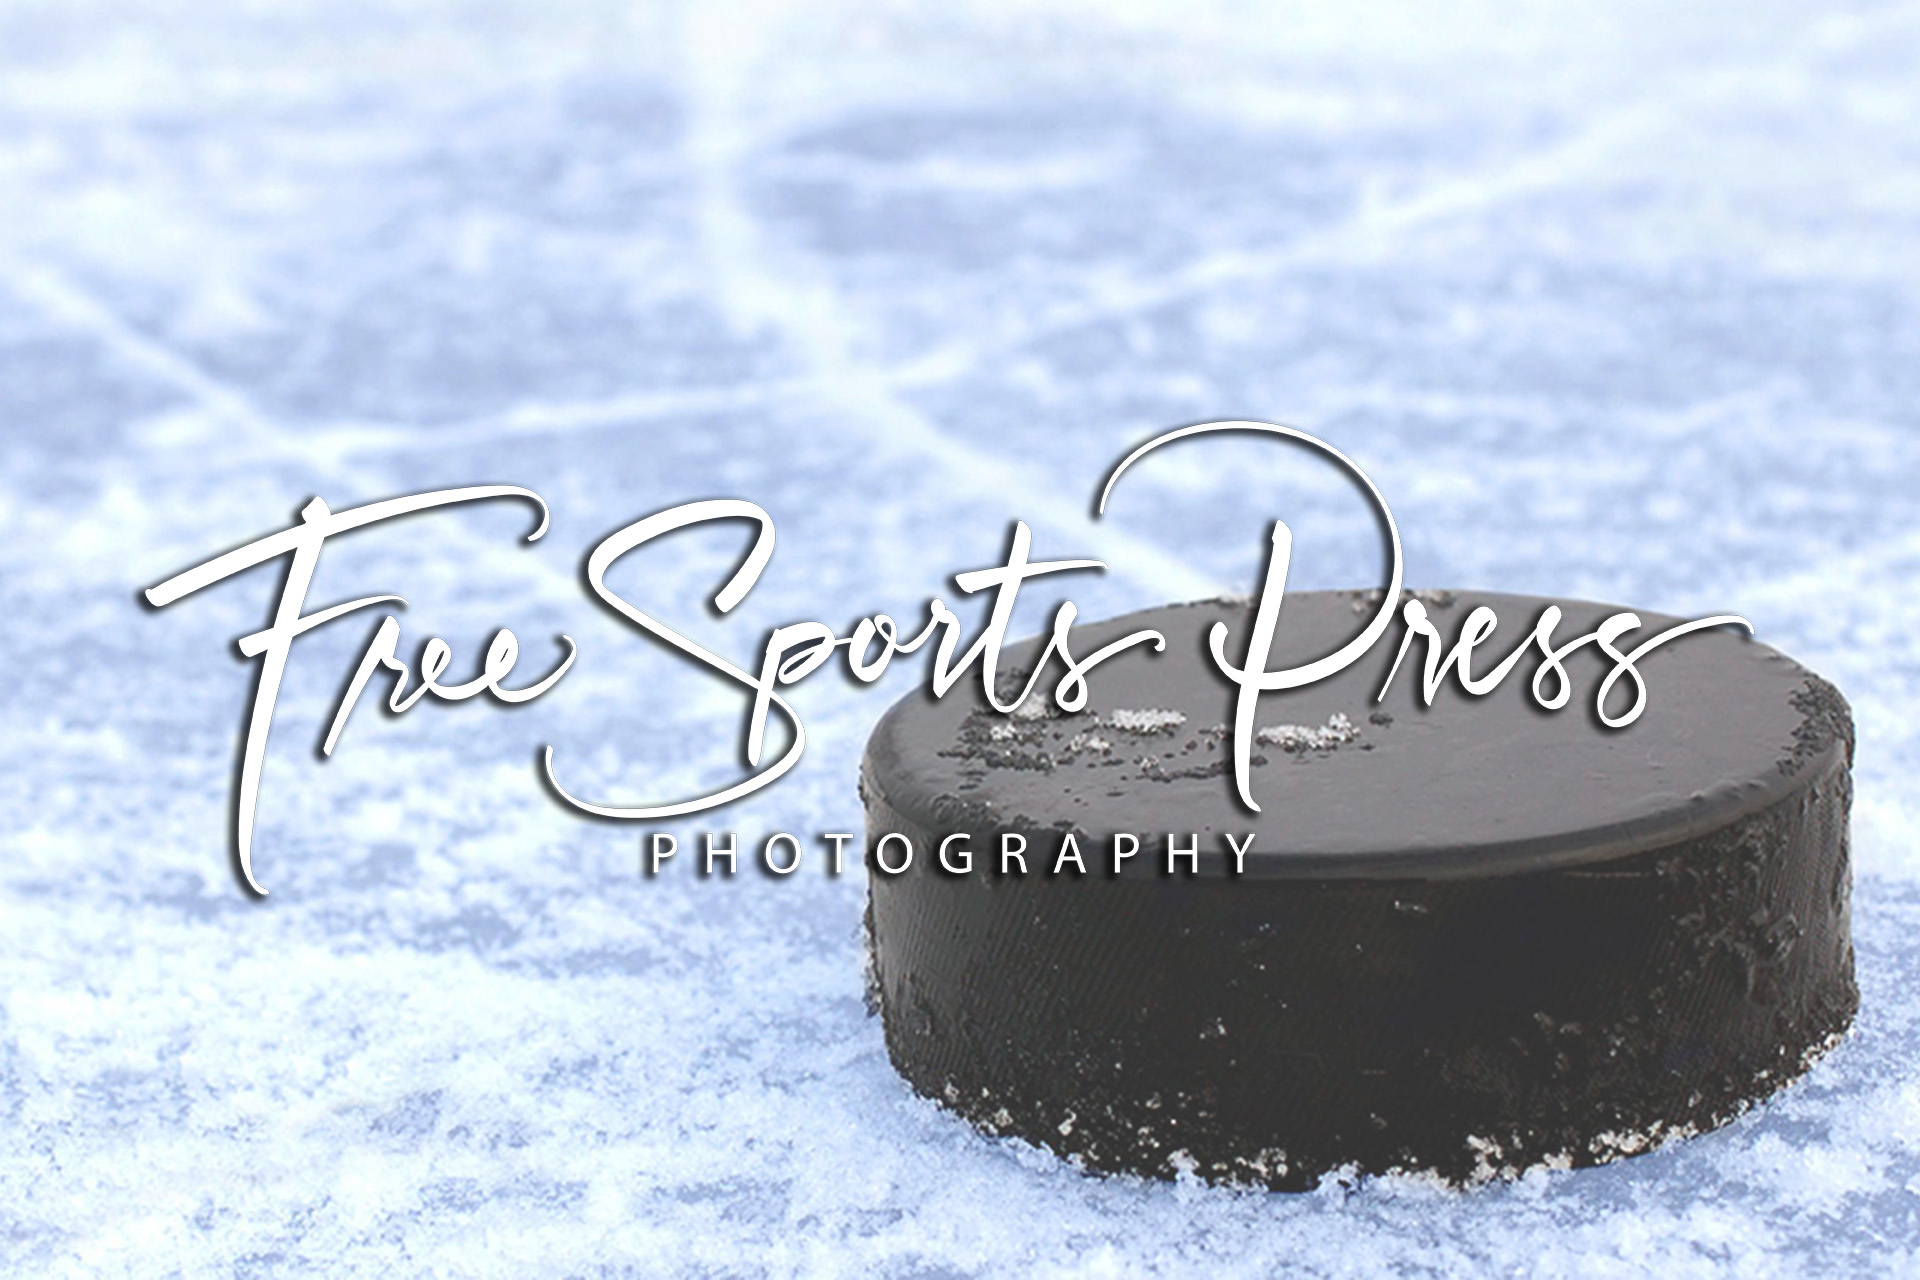 2021 Free Sports Press – Rush Photo Gallery 001